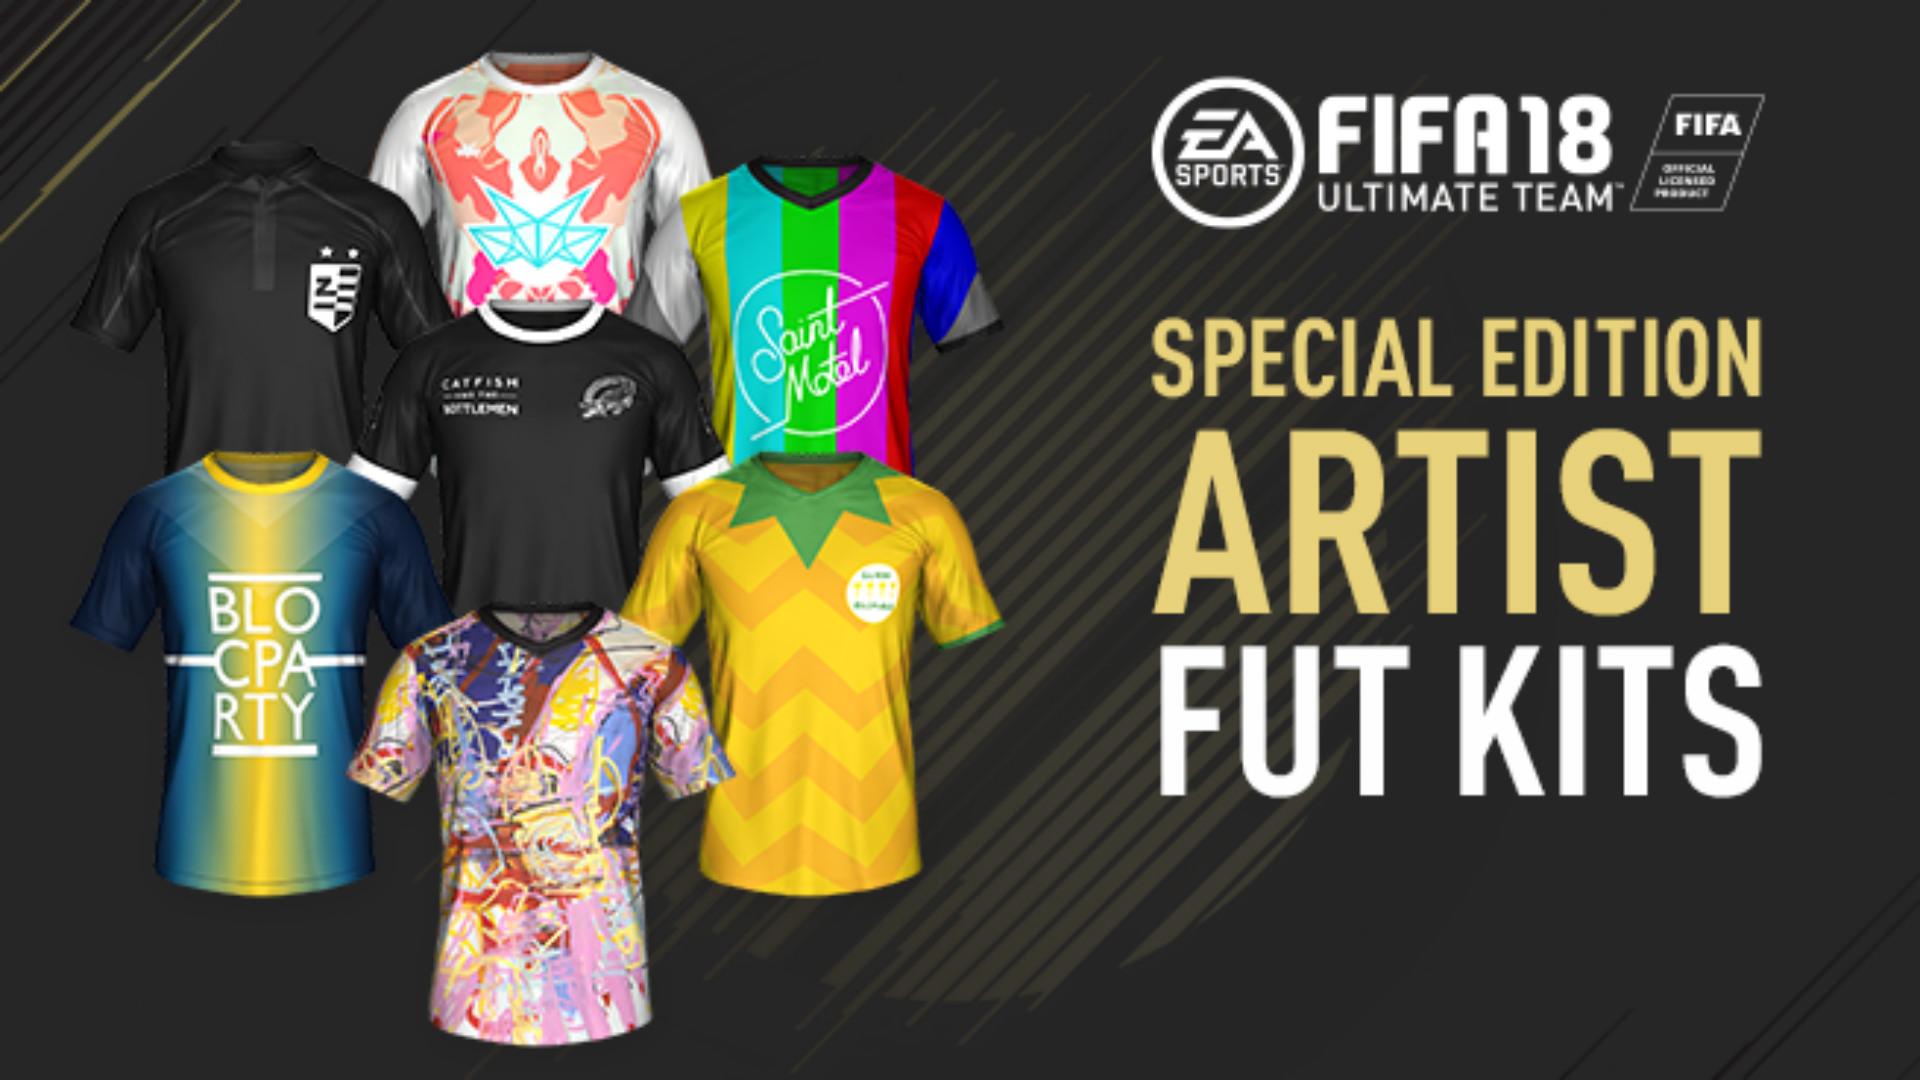 FIFA 18 FUT special kits